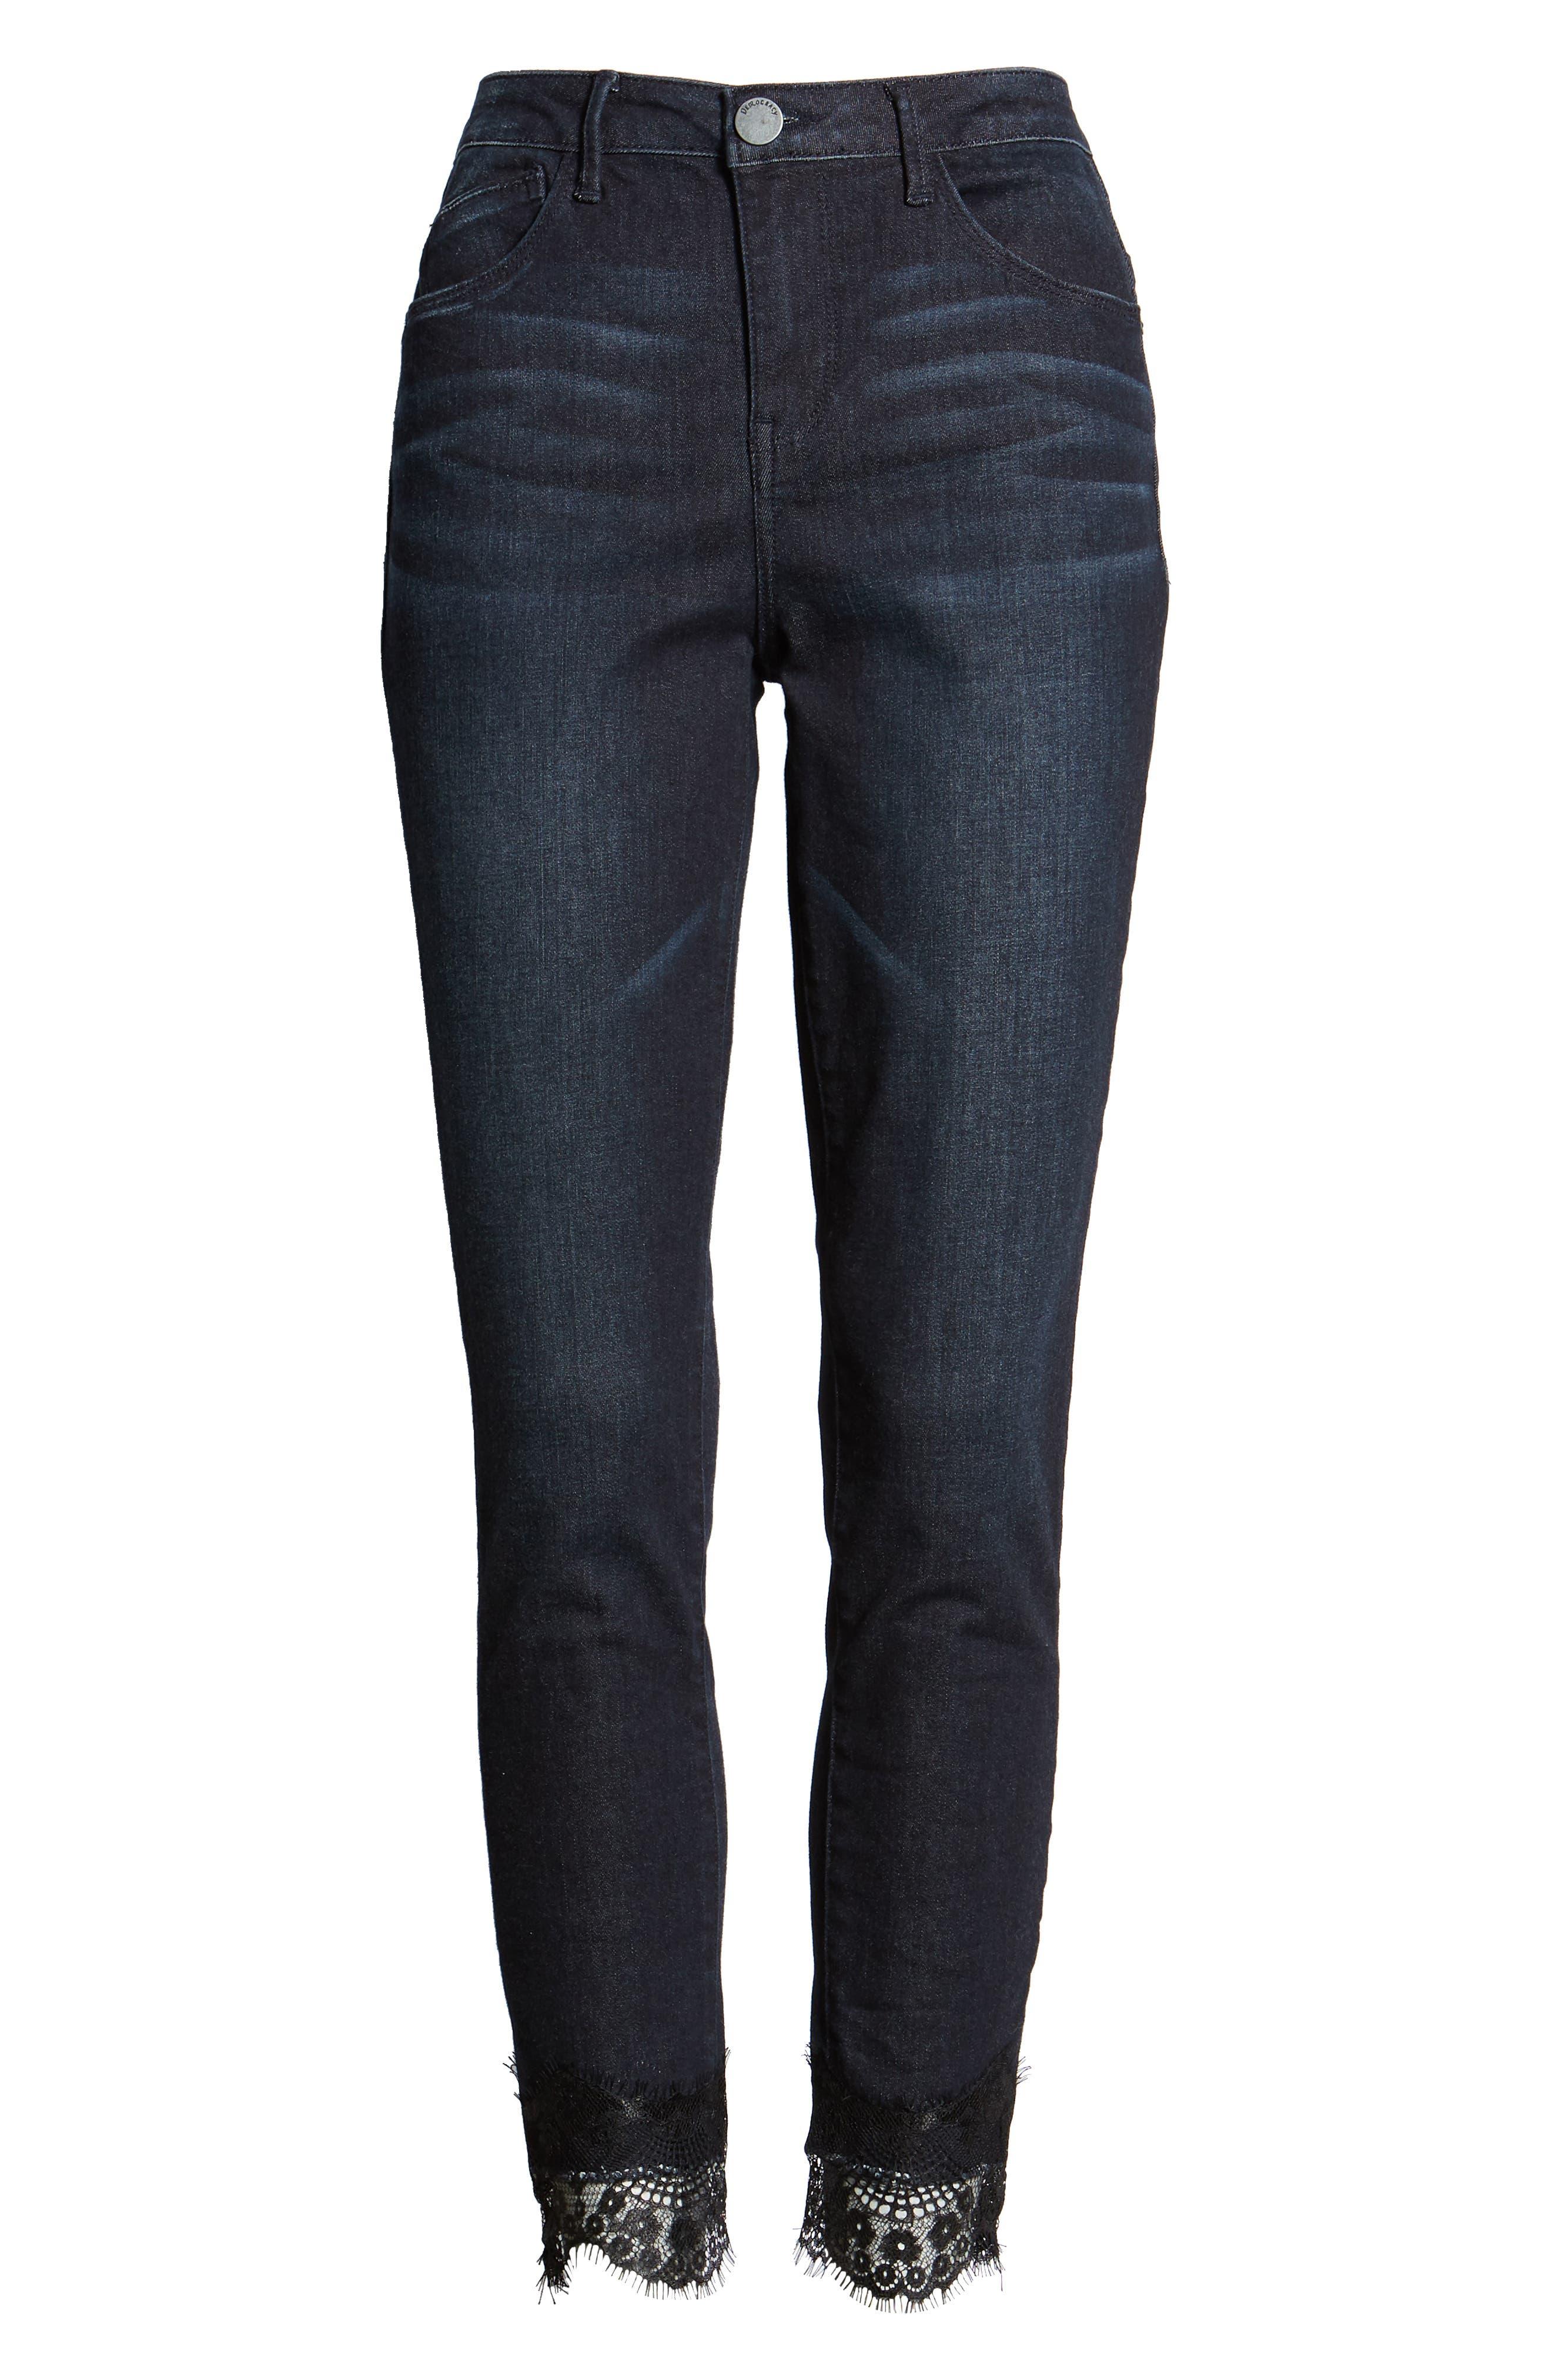 WIT & WISDOM,                             High Waist Eyelash Lace Ankle Skimmer Jeans,                             Alternate thumbnail 7, color,                             402